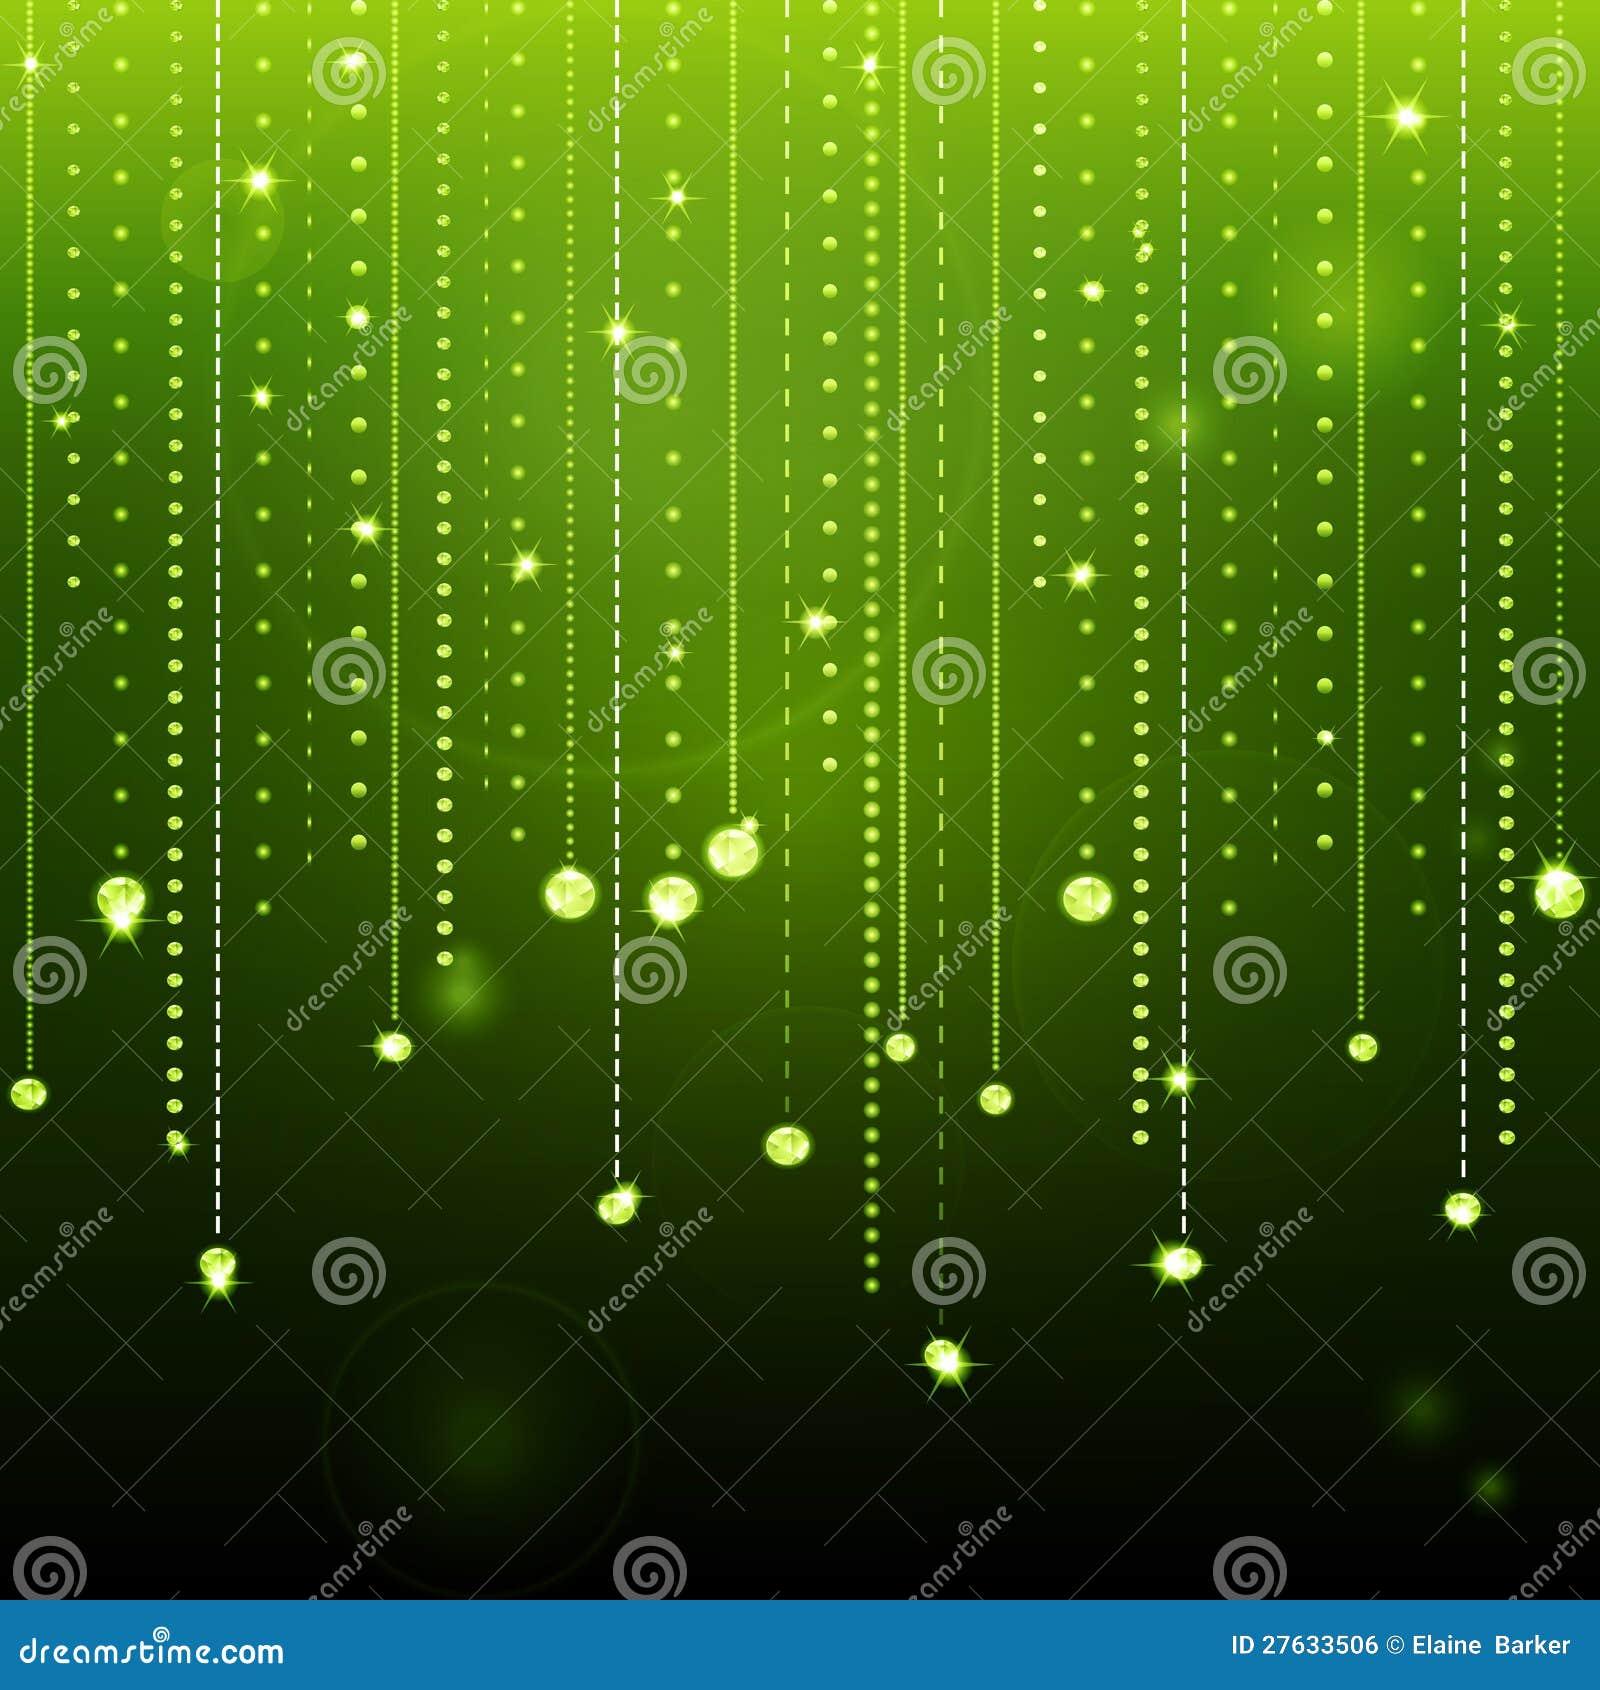 glowing green diamond background stock vector